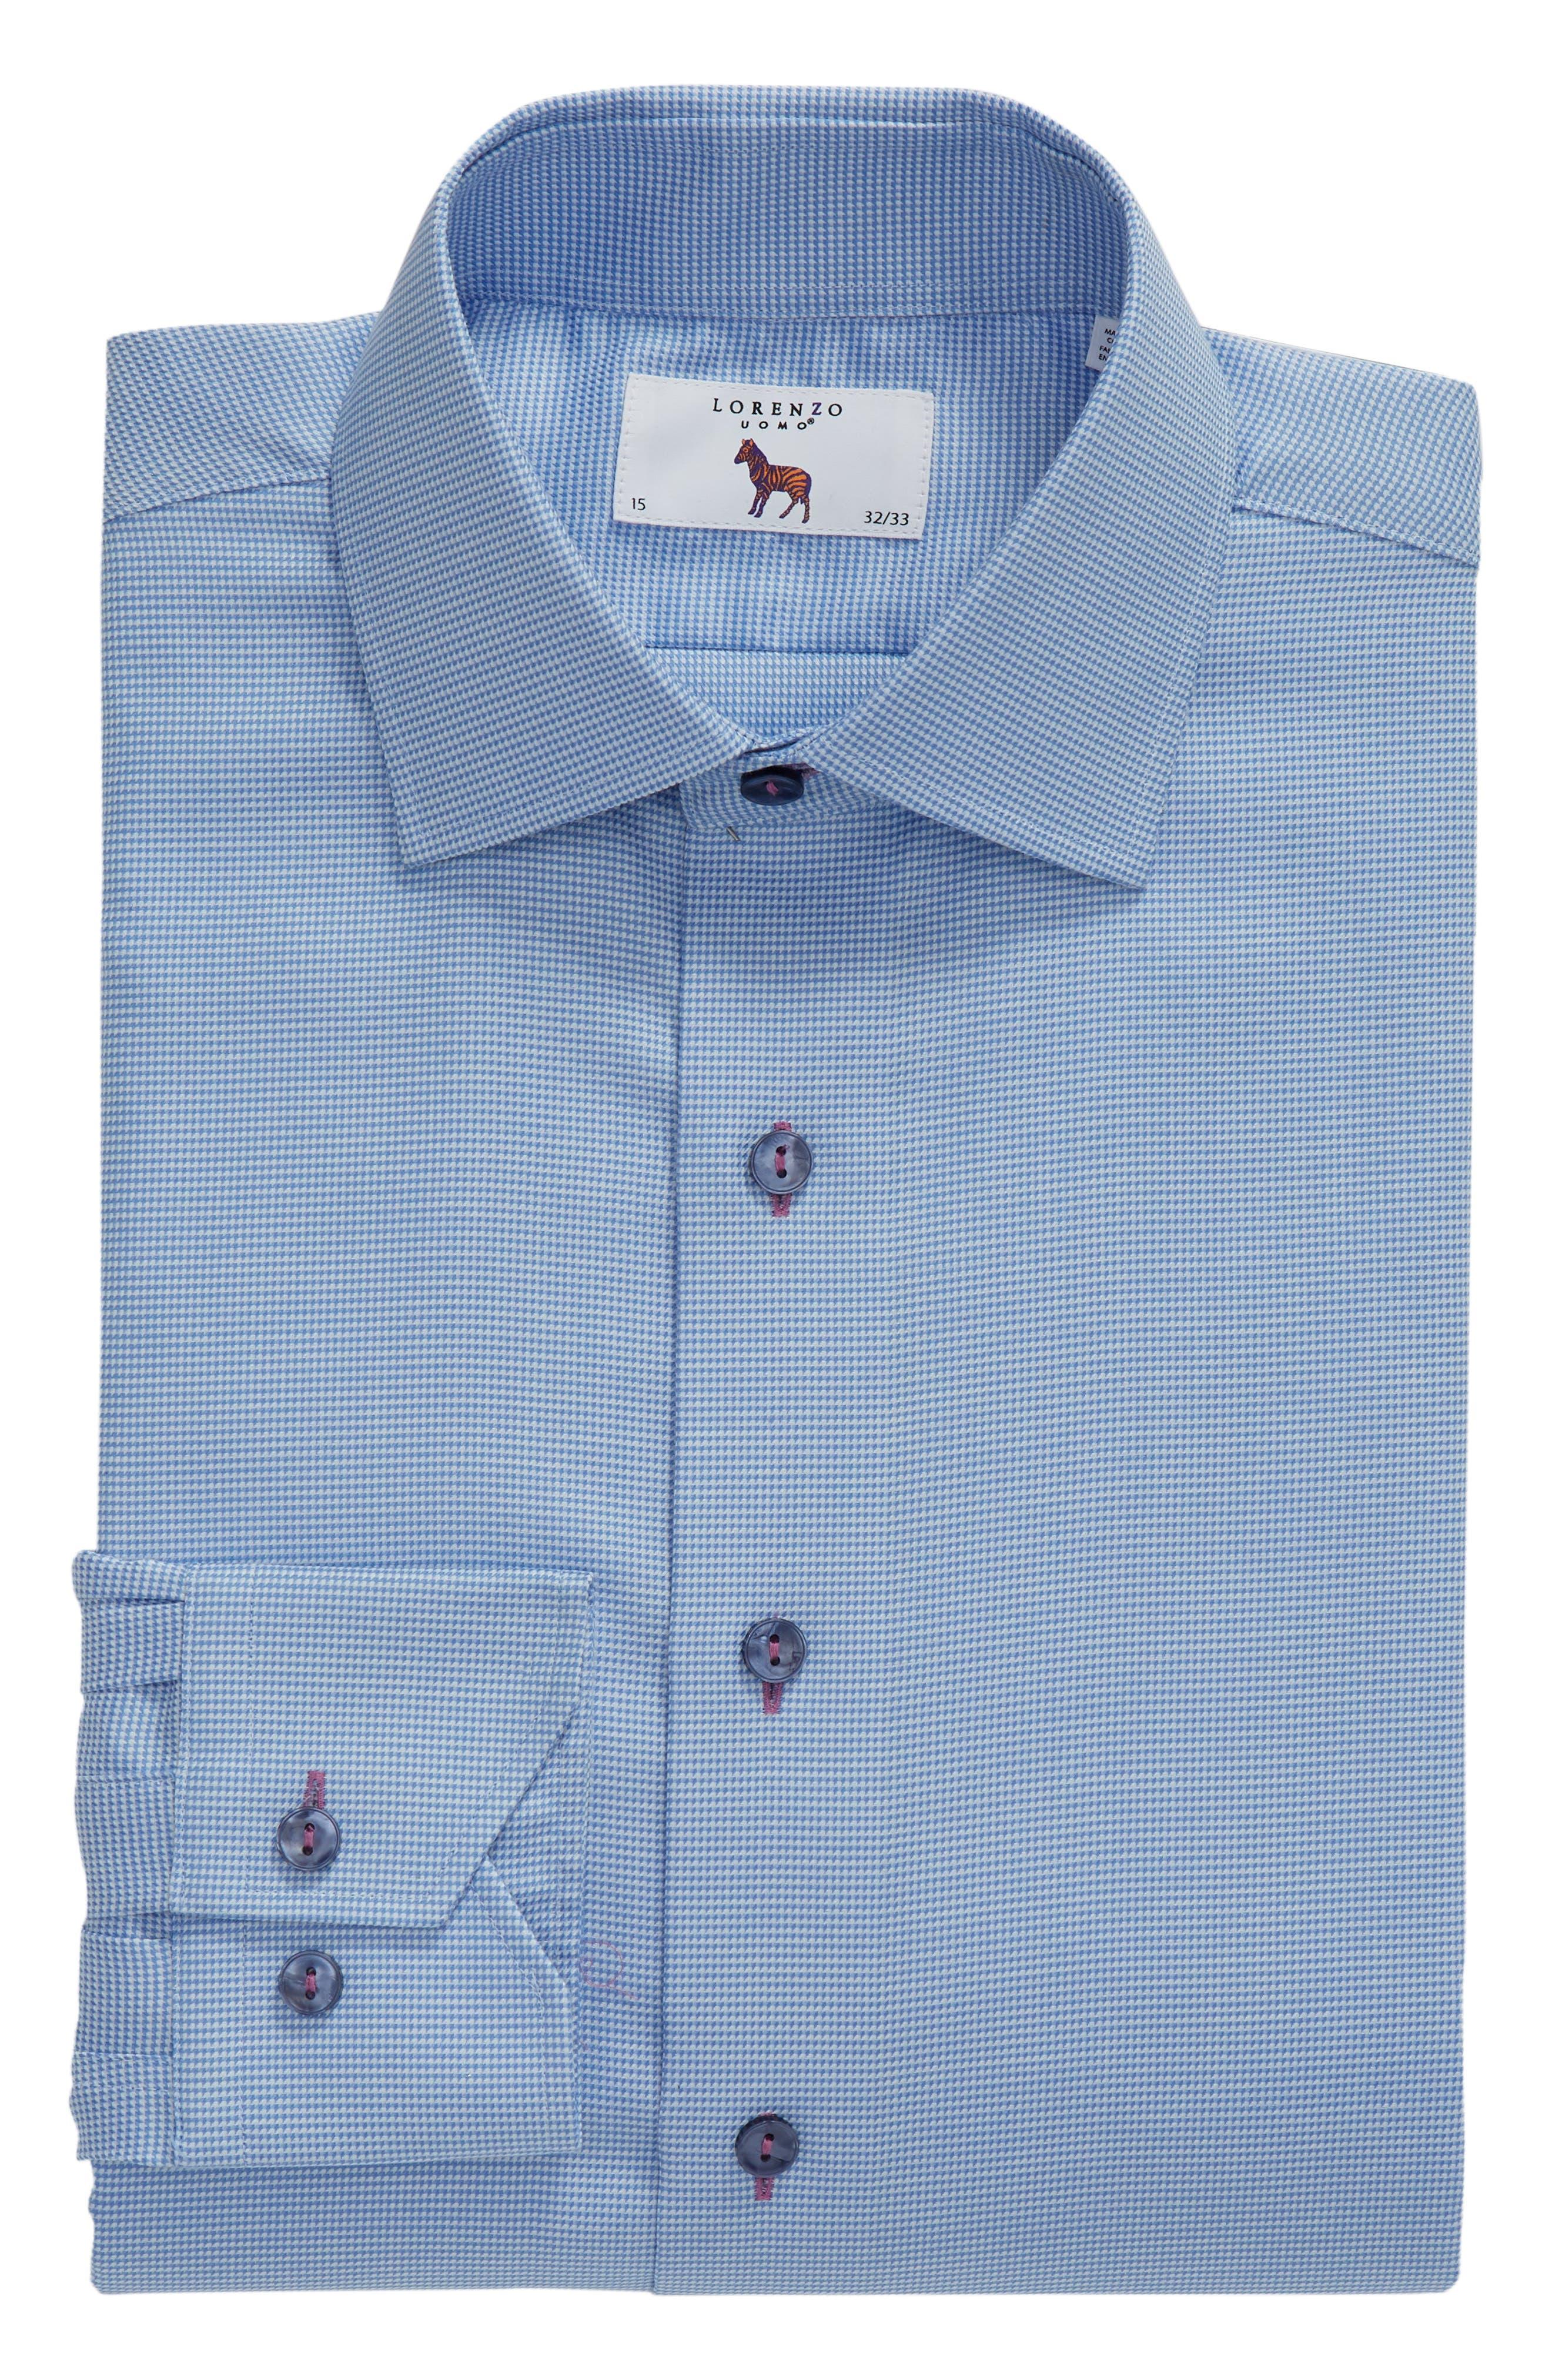 Regular Fit Check Dress Shirt,                             Alternate thumbnail 5, color,                             GREY